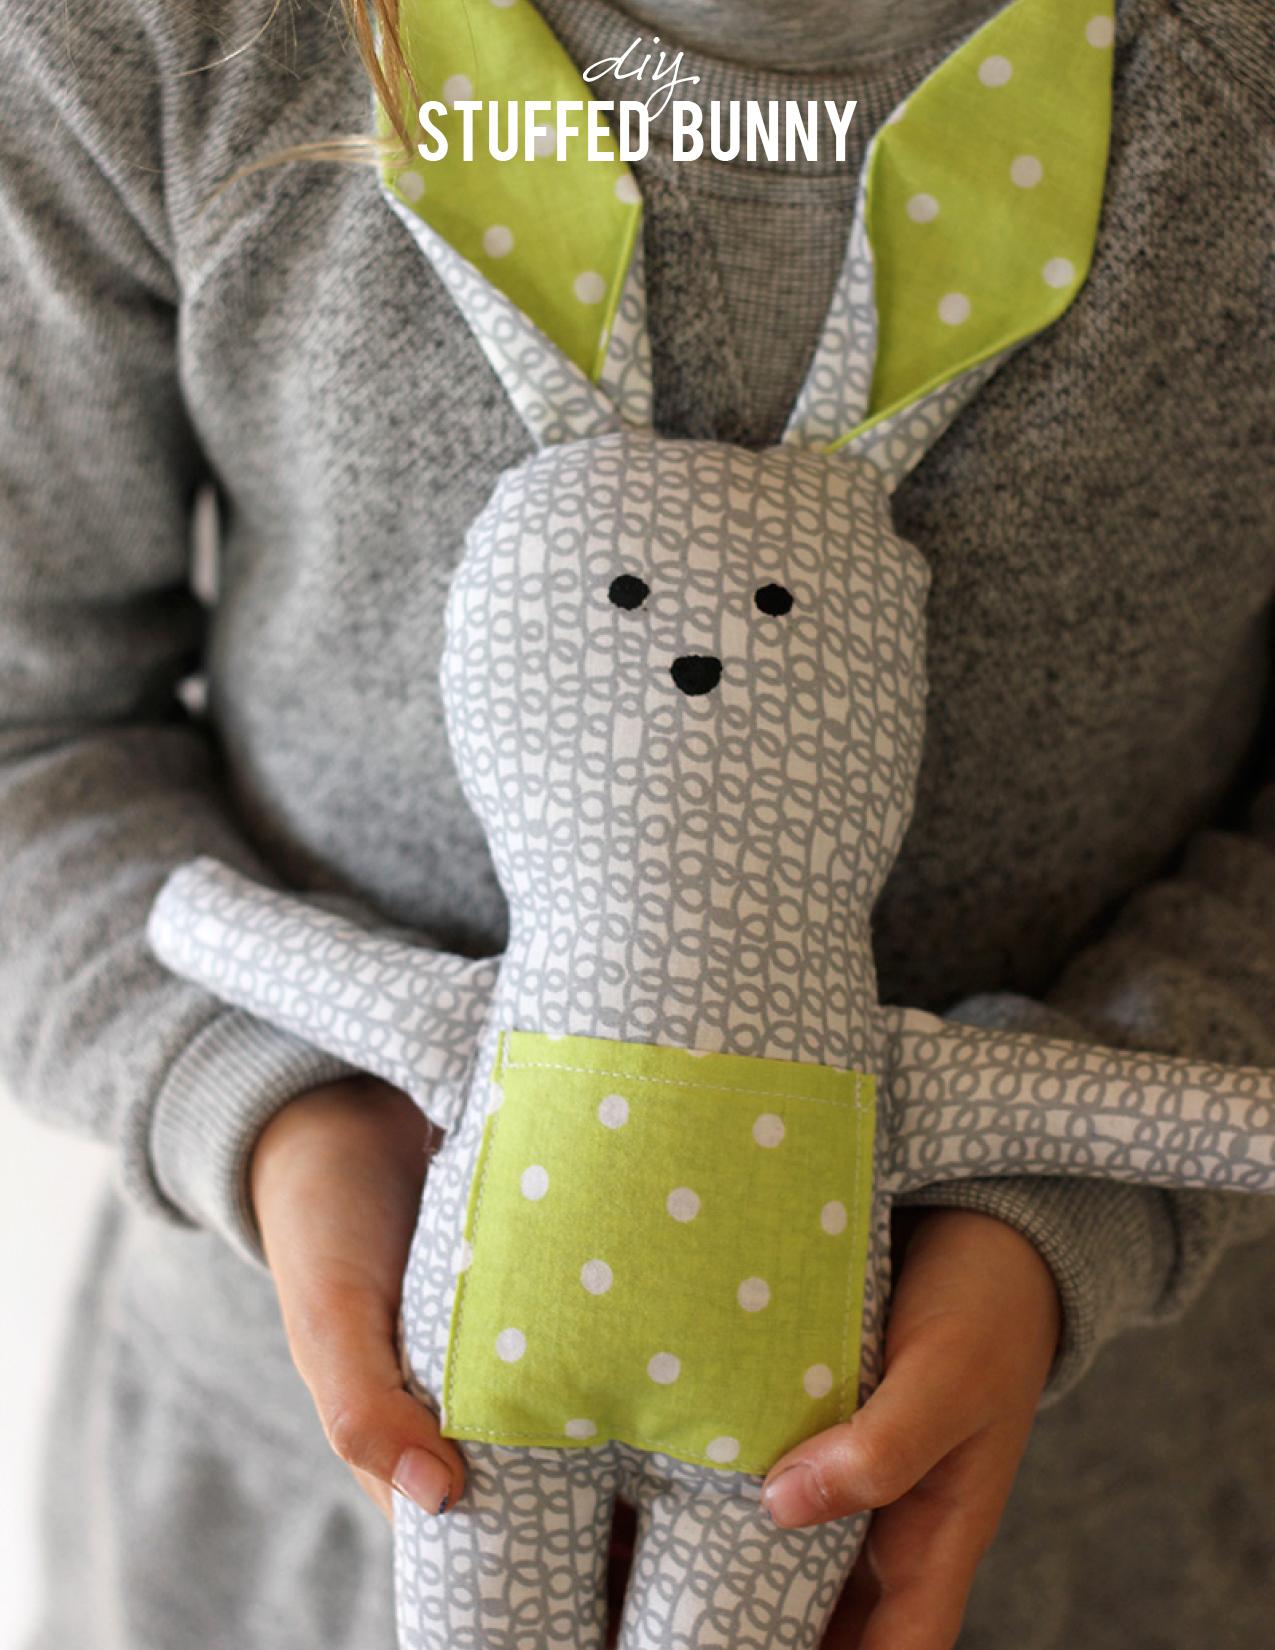 stuffed-bunny-main-7.jpg